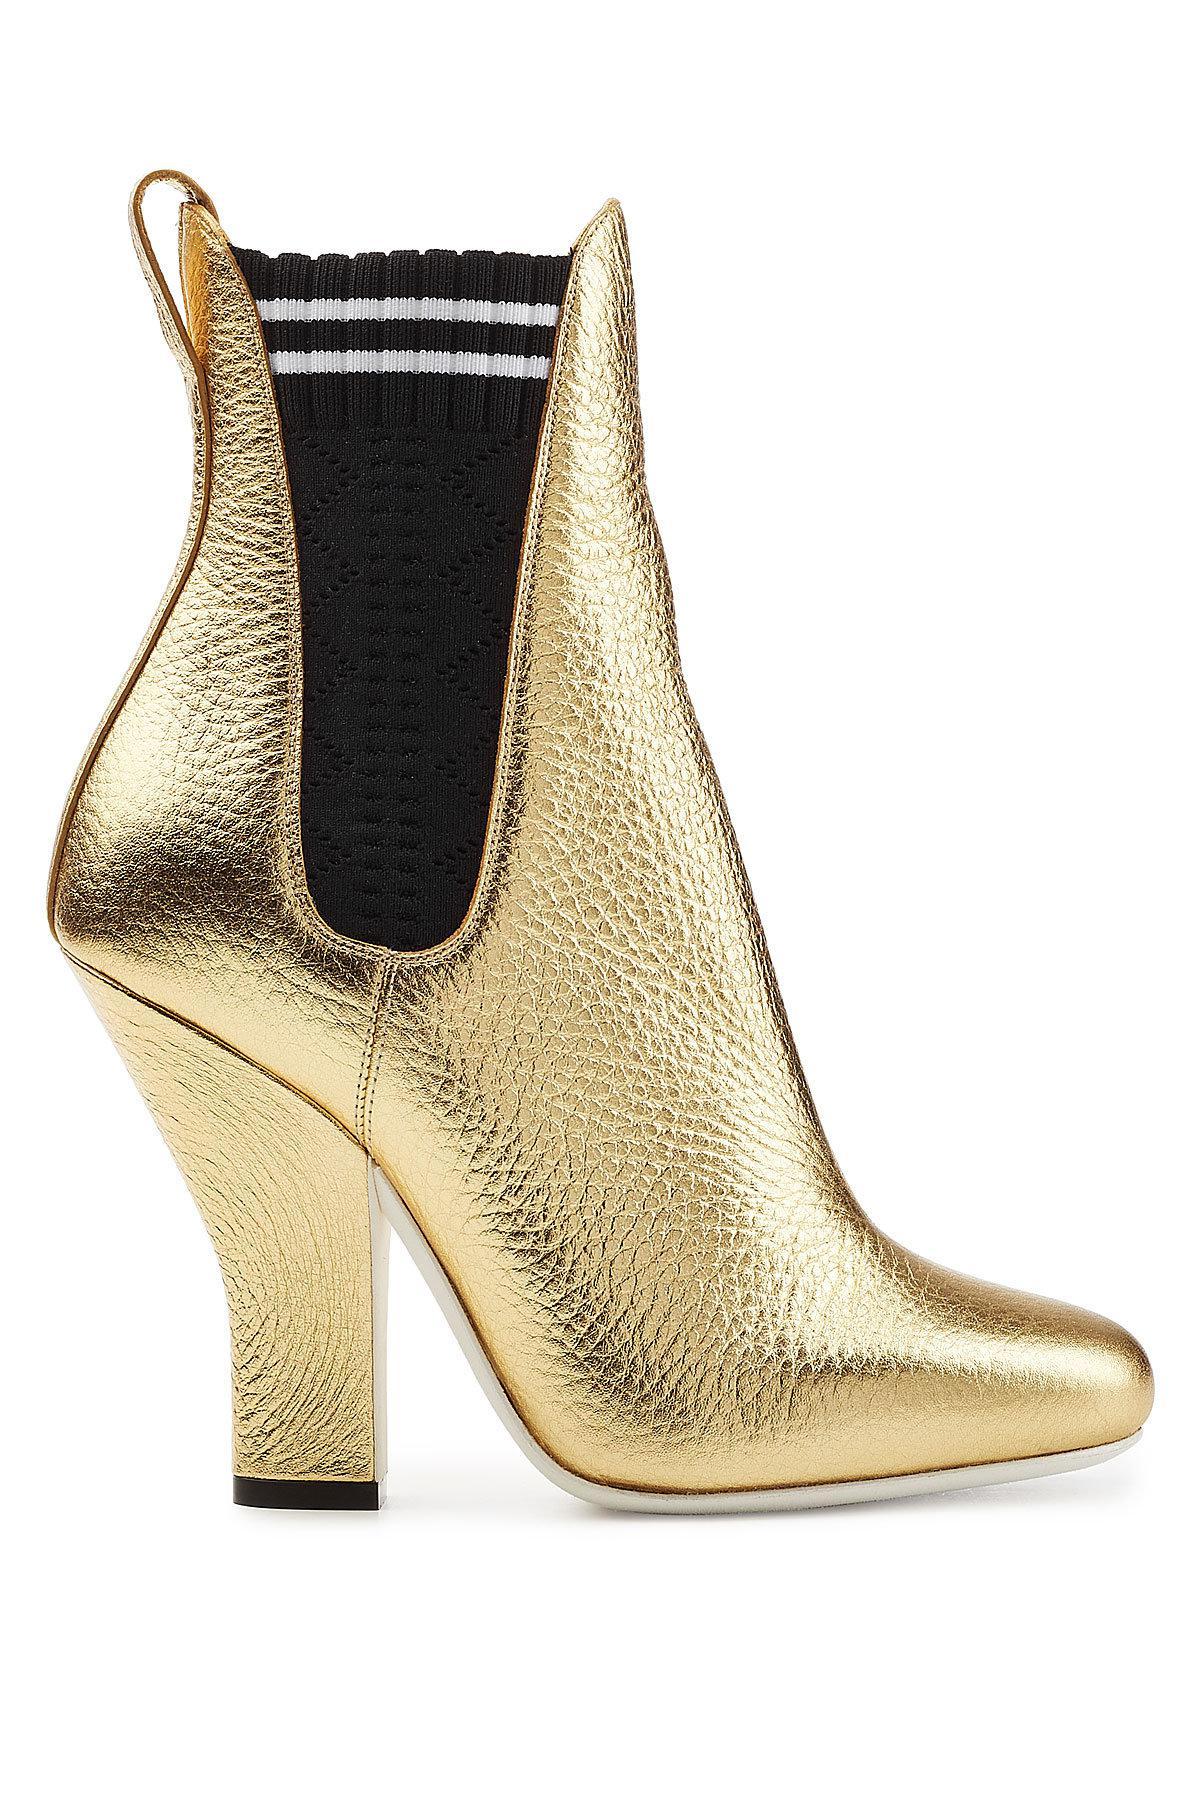 metallic ankle boots Fendi kPJPHYqNiZ